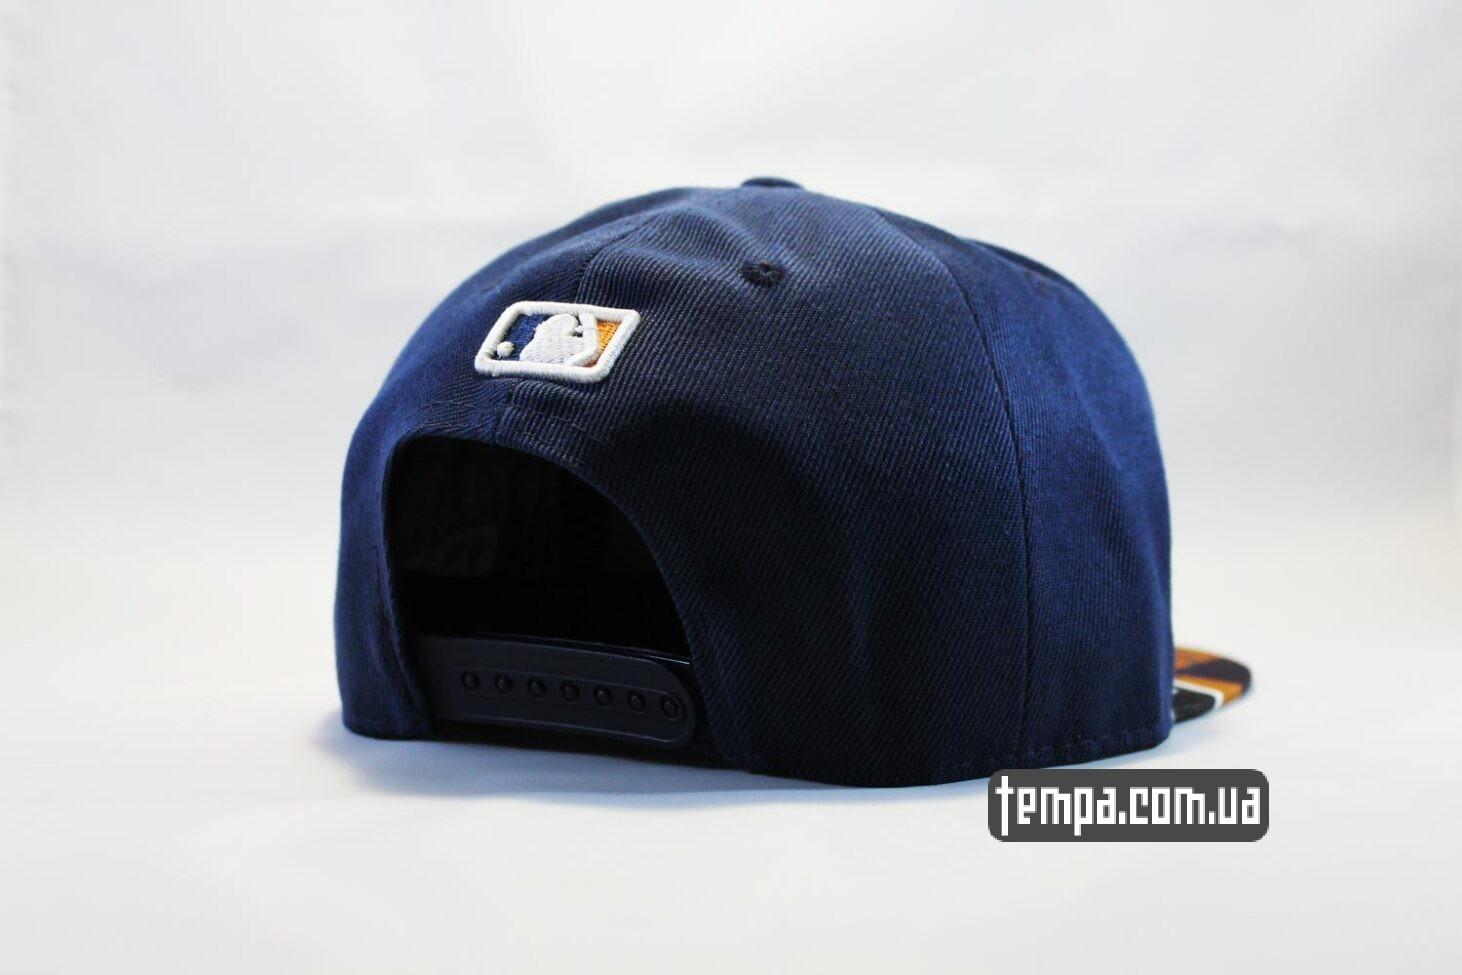 кепка снепбек Украина кепка snapback Detroit синяя NewEra